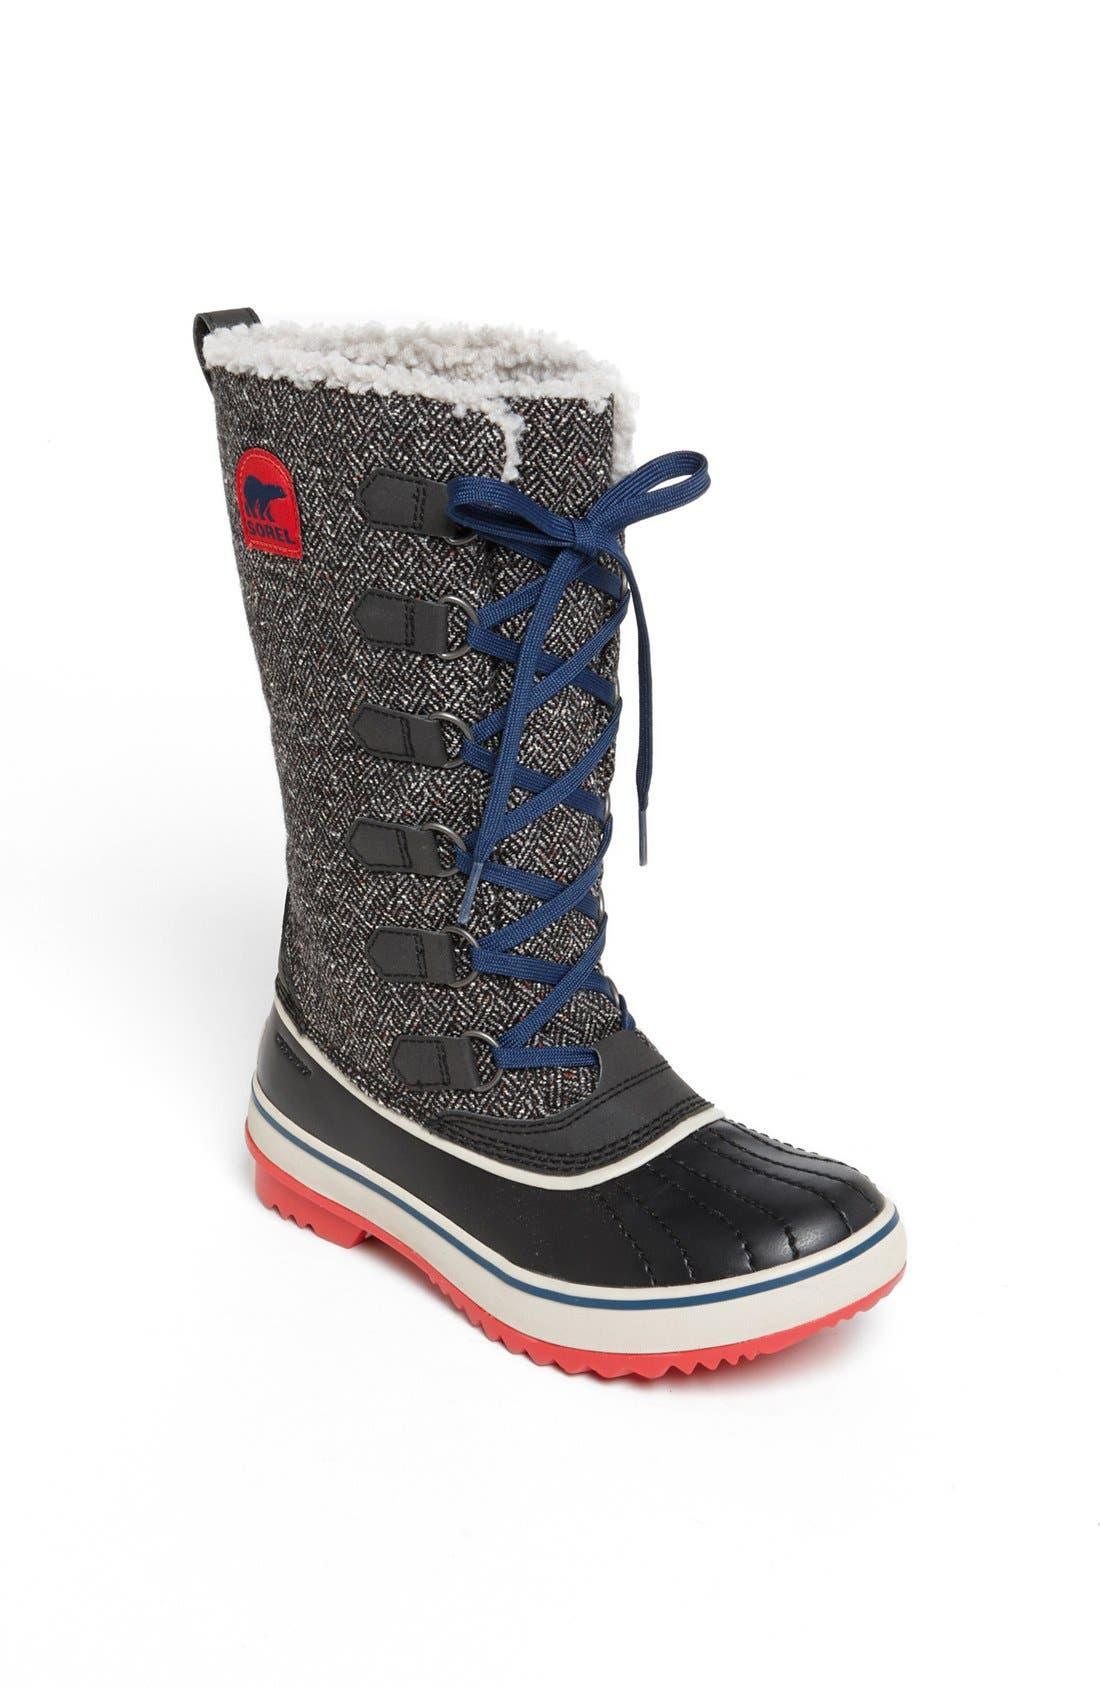 Main Image - SOREL 'Tivoli High' Waterproof Boot